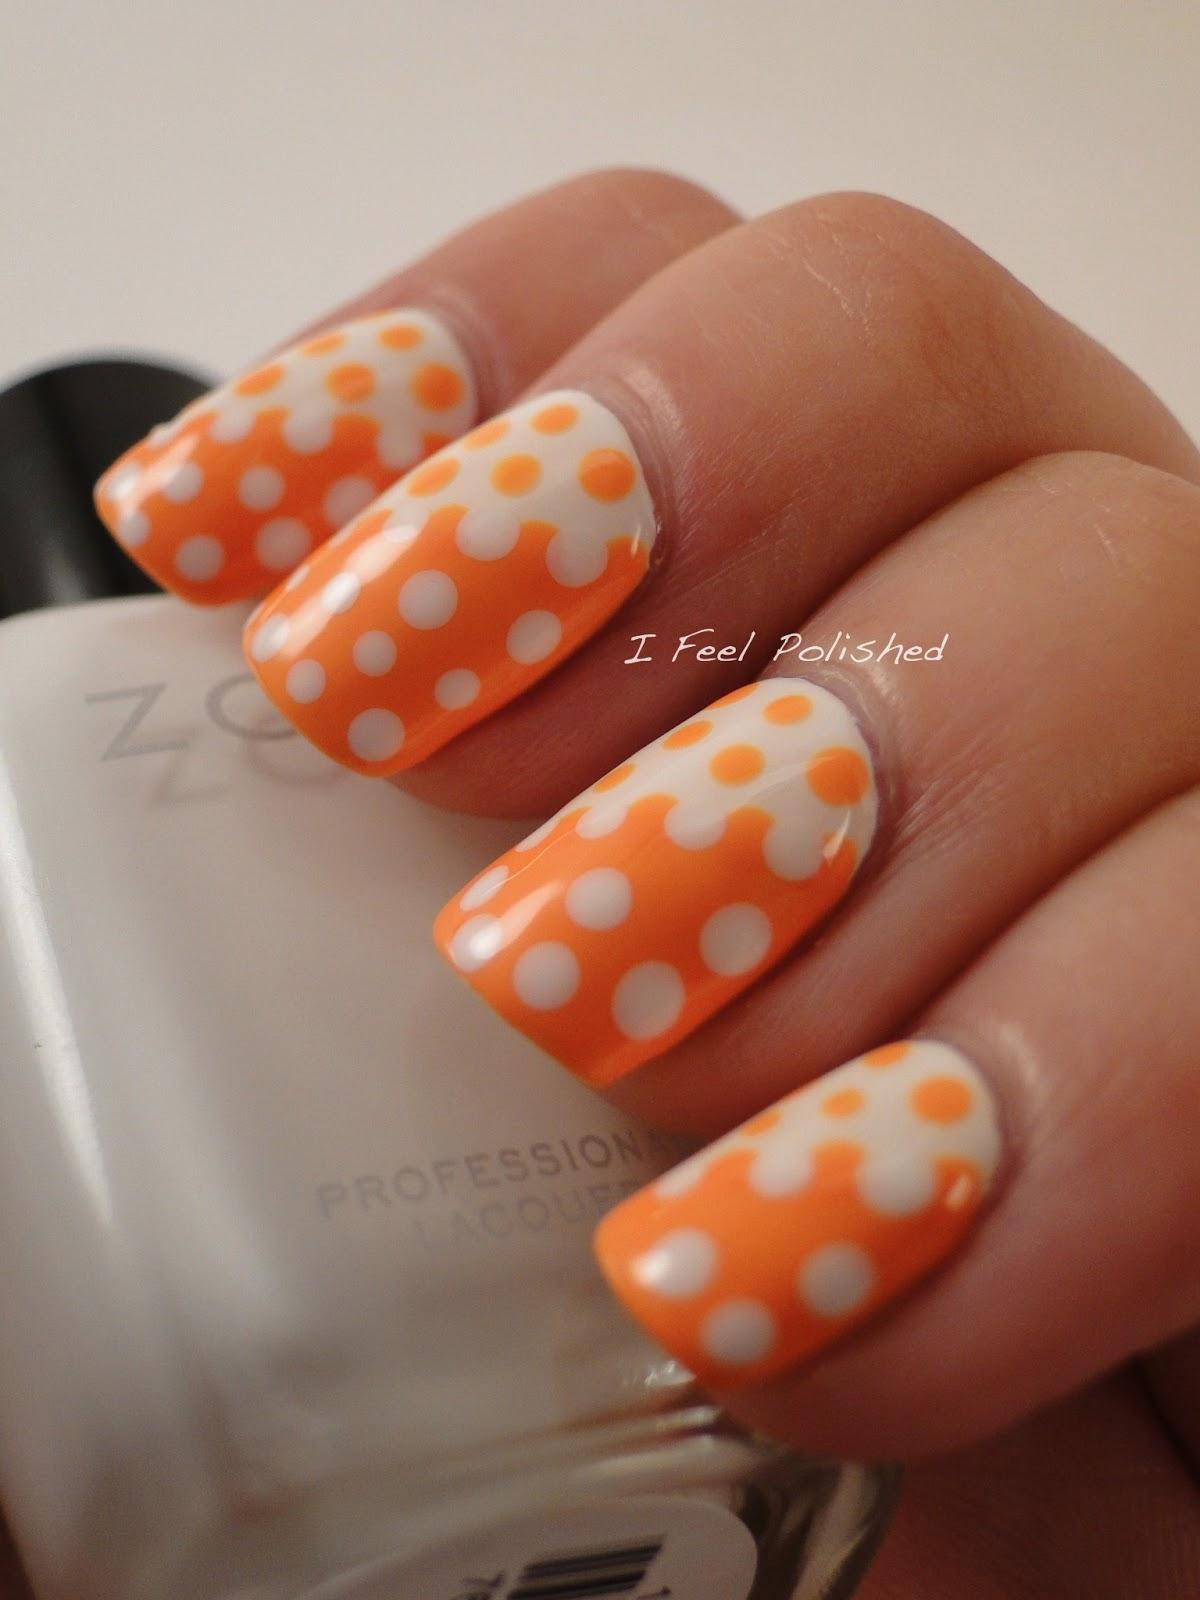 acrylic nails 6 october photo - 2